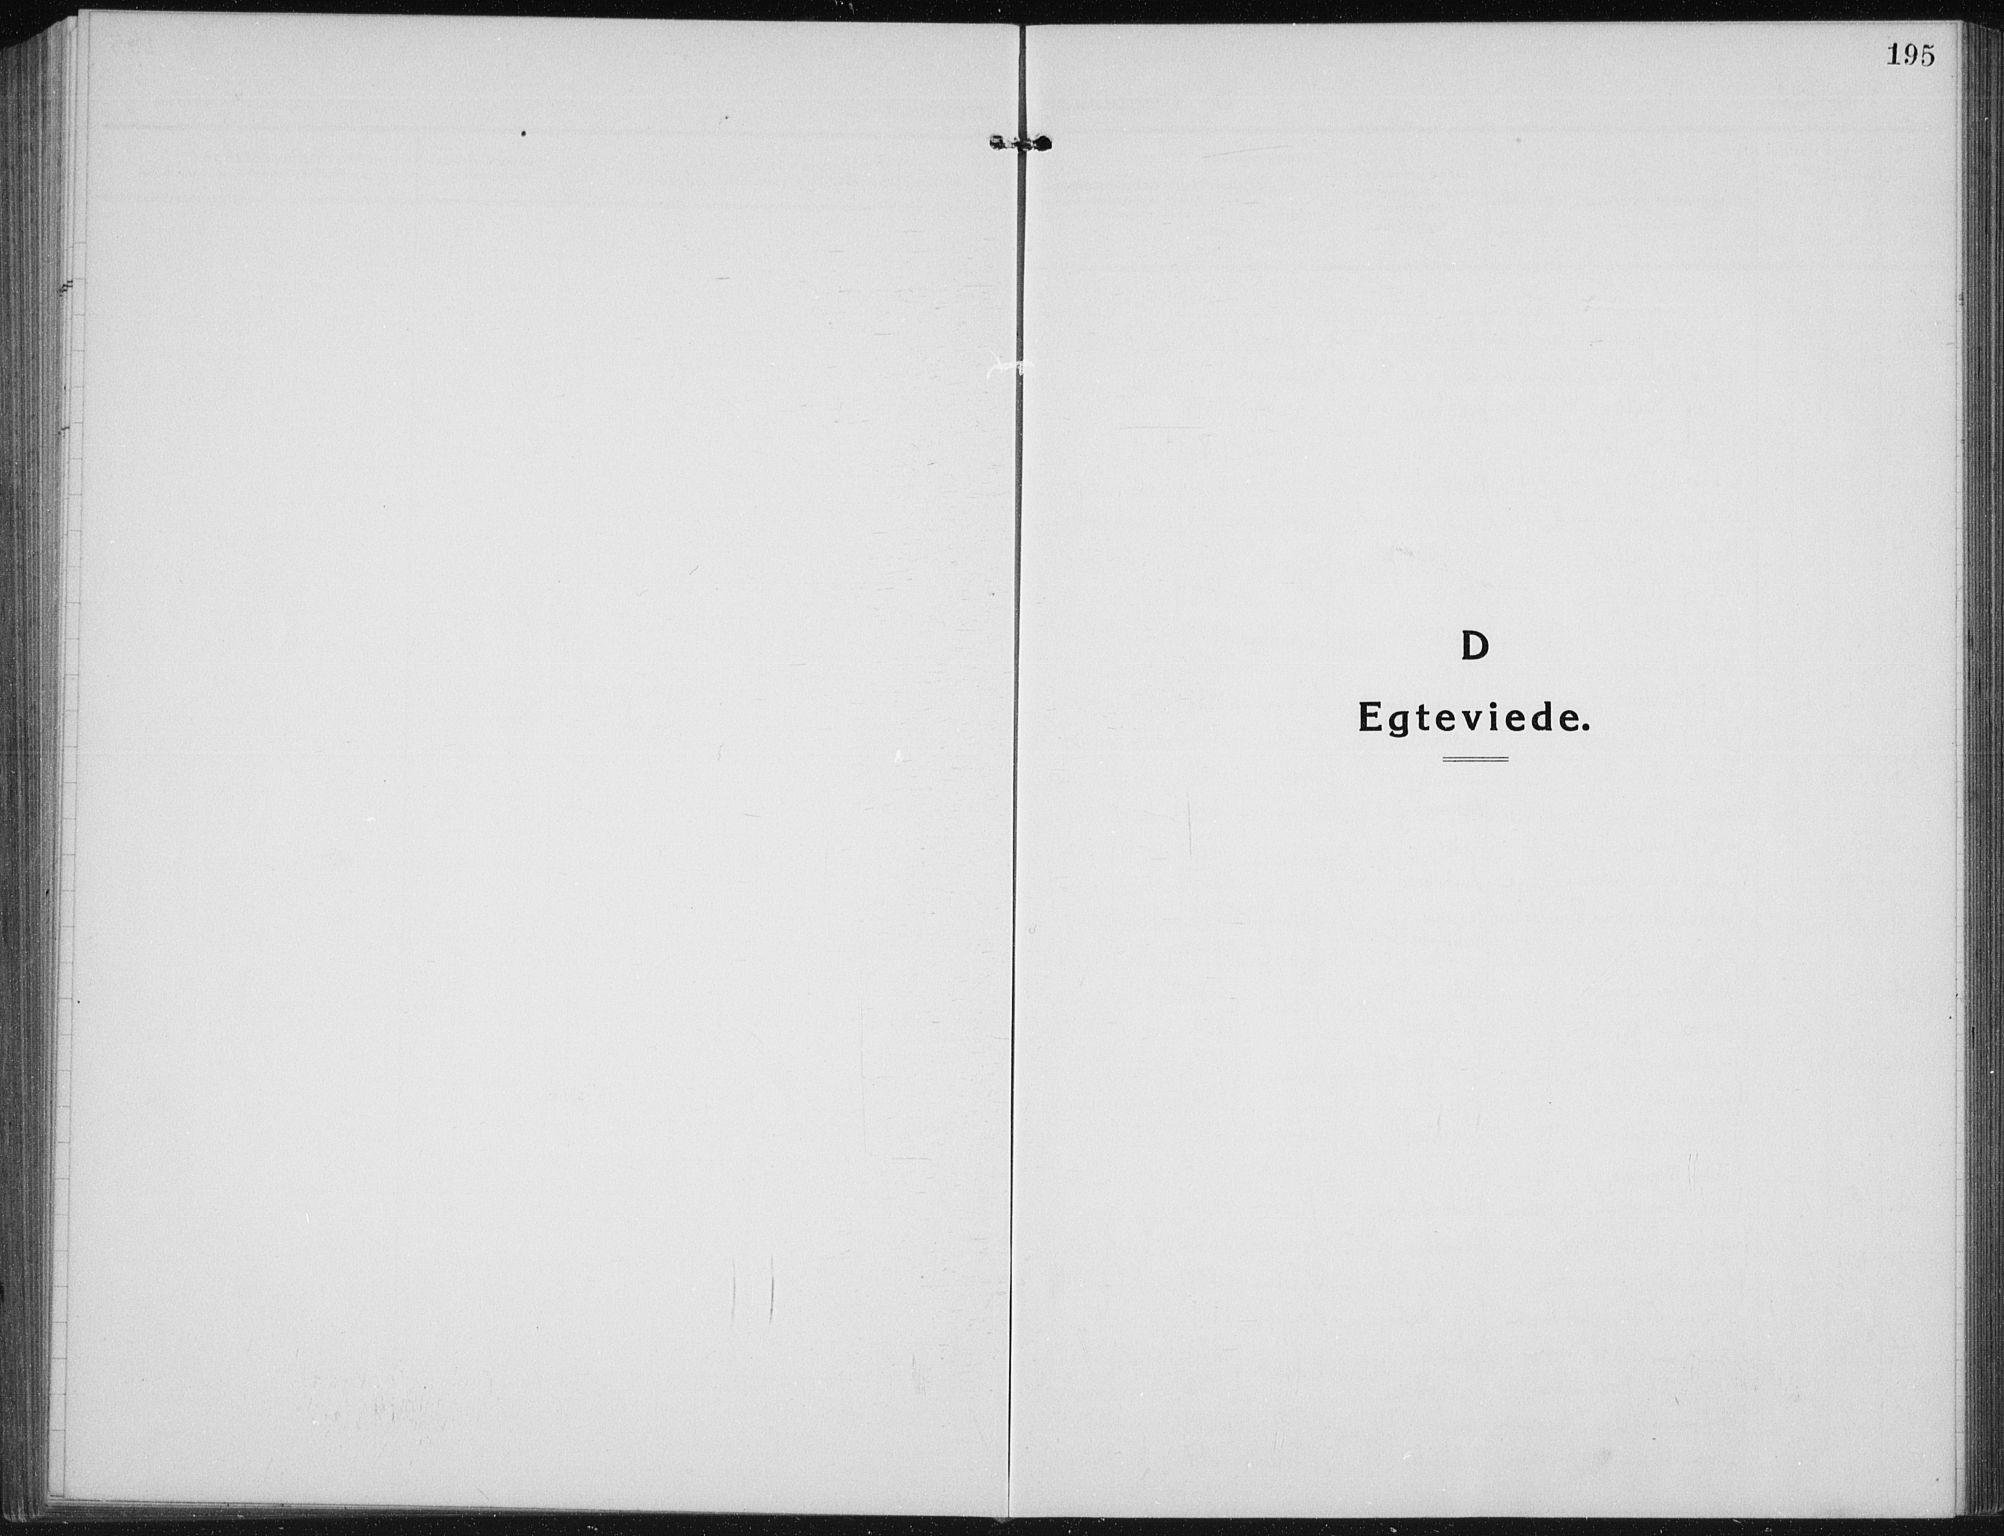 SAH, Vardal prestekontor, H/Ha/Hab/L0017: Klokkerbok nr. 17, 1922-1941, s. 195